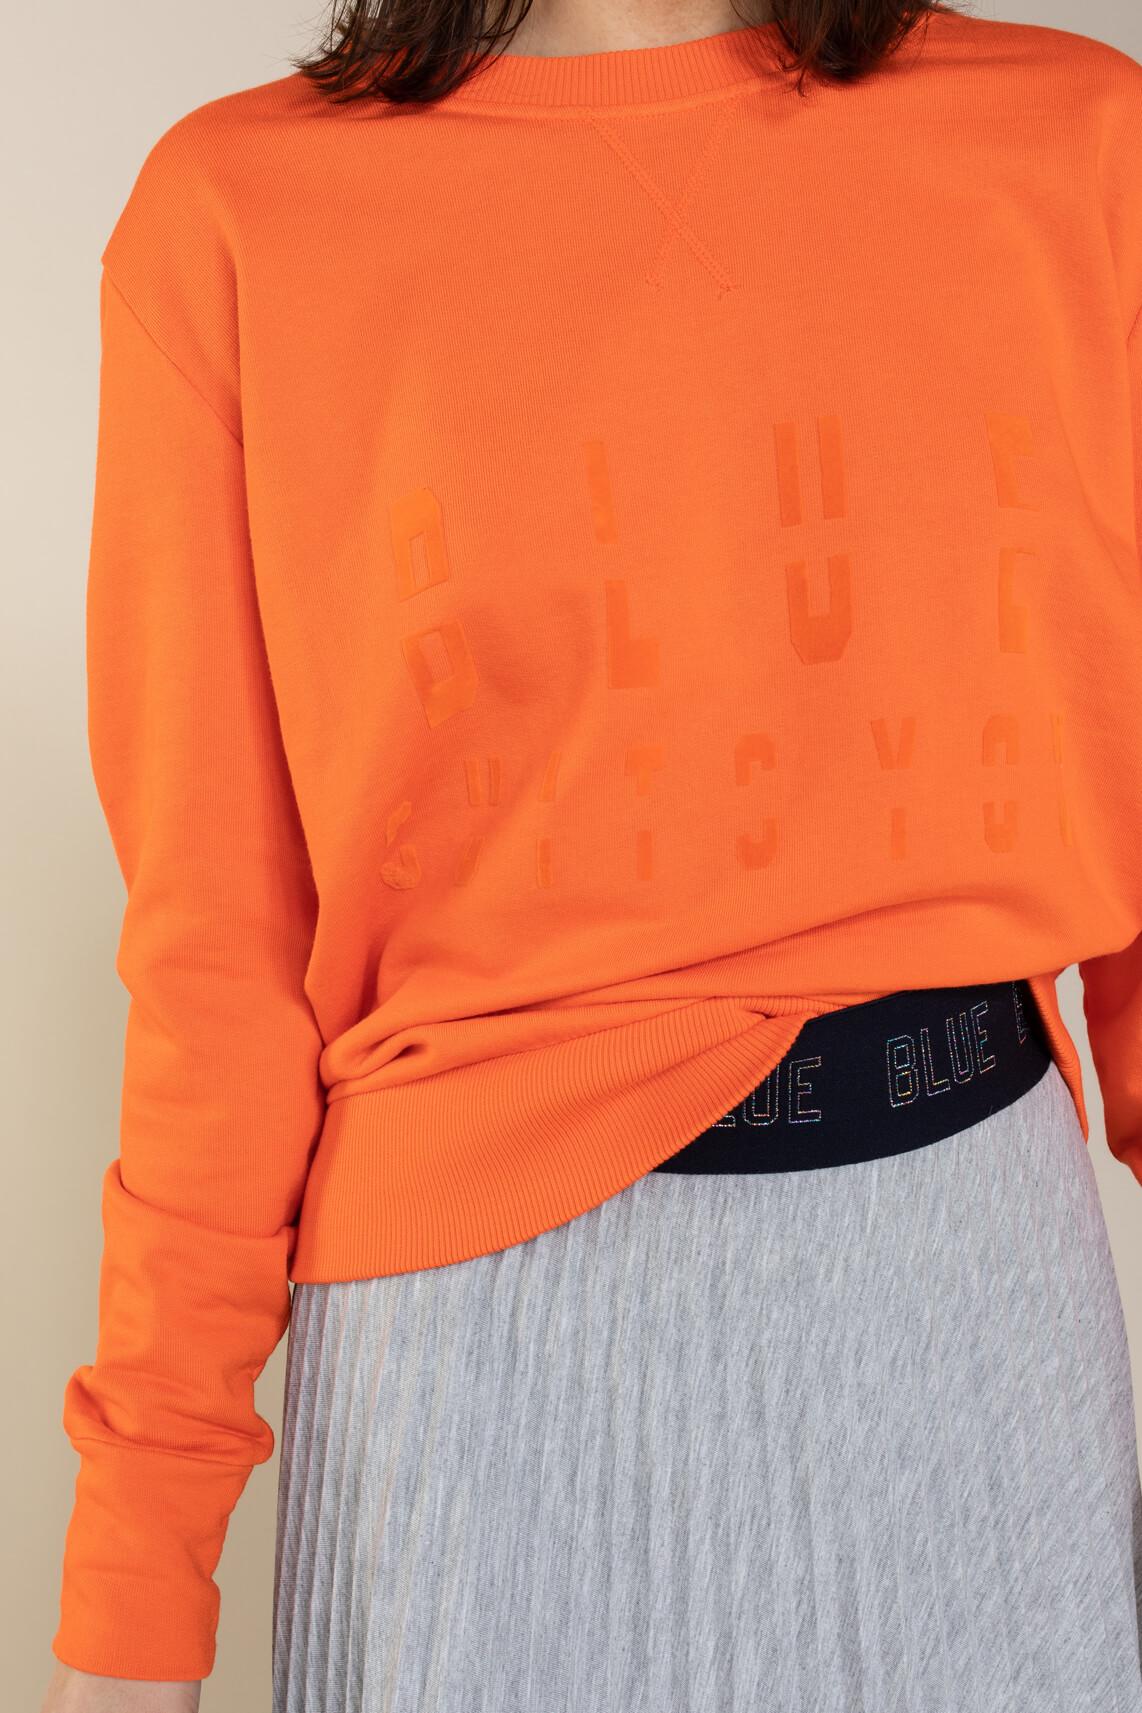 Anna Blue Dames Sweater Blue suits you Oranje